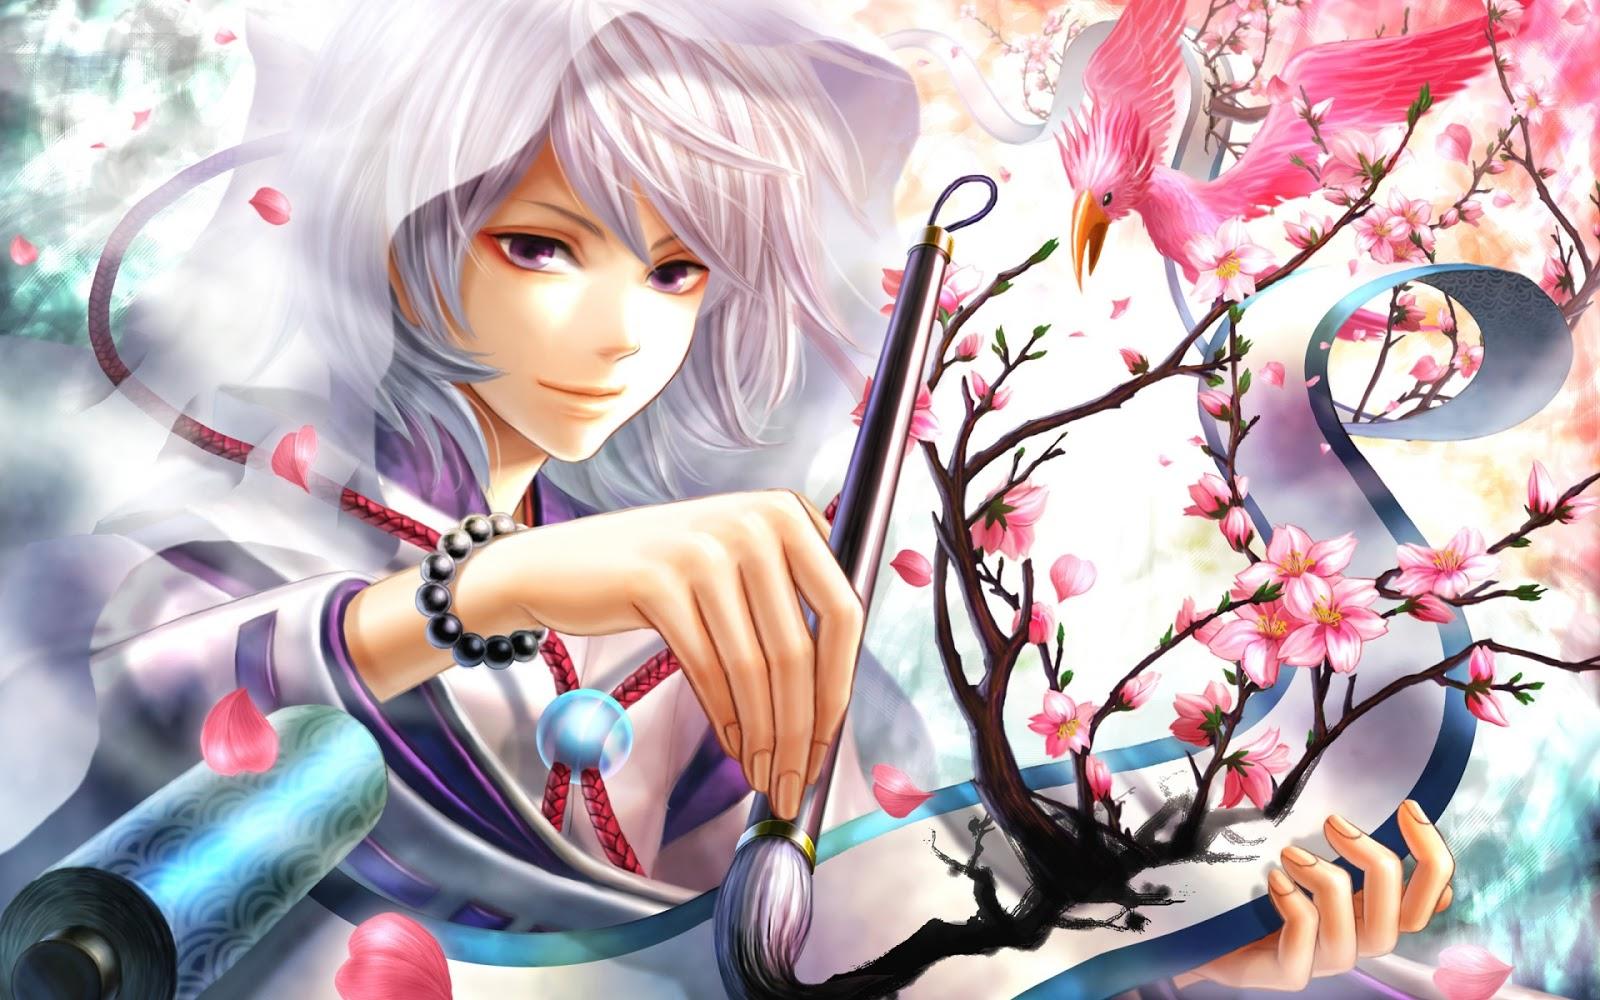 48 Cute Anime Girls Hd Wallpaper On Wallpapersafari